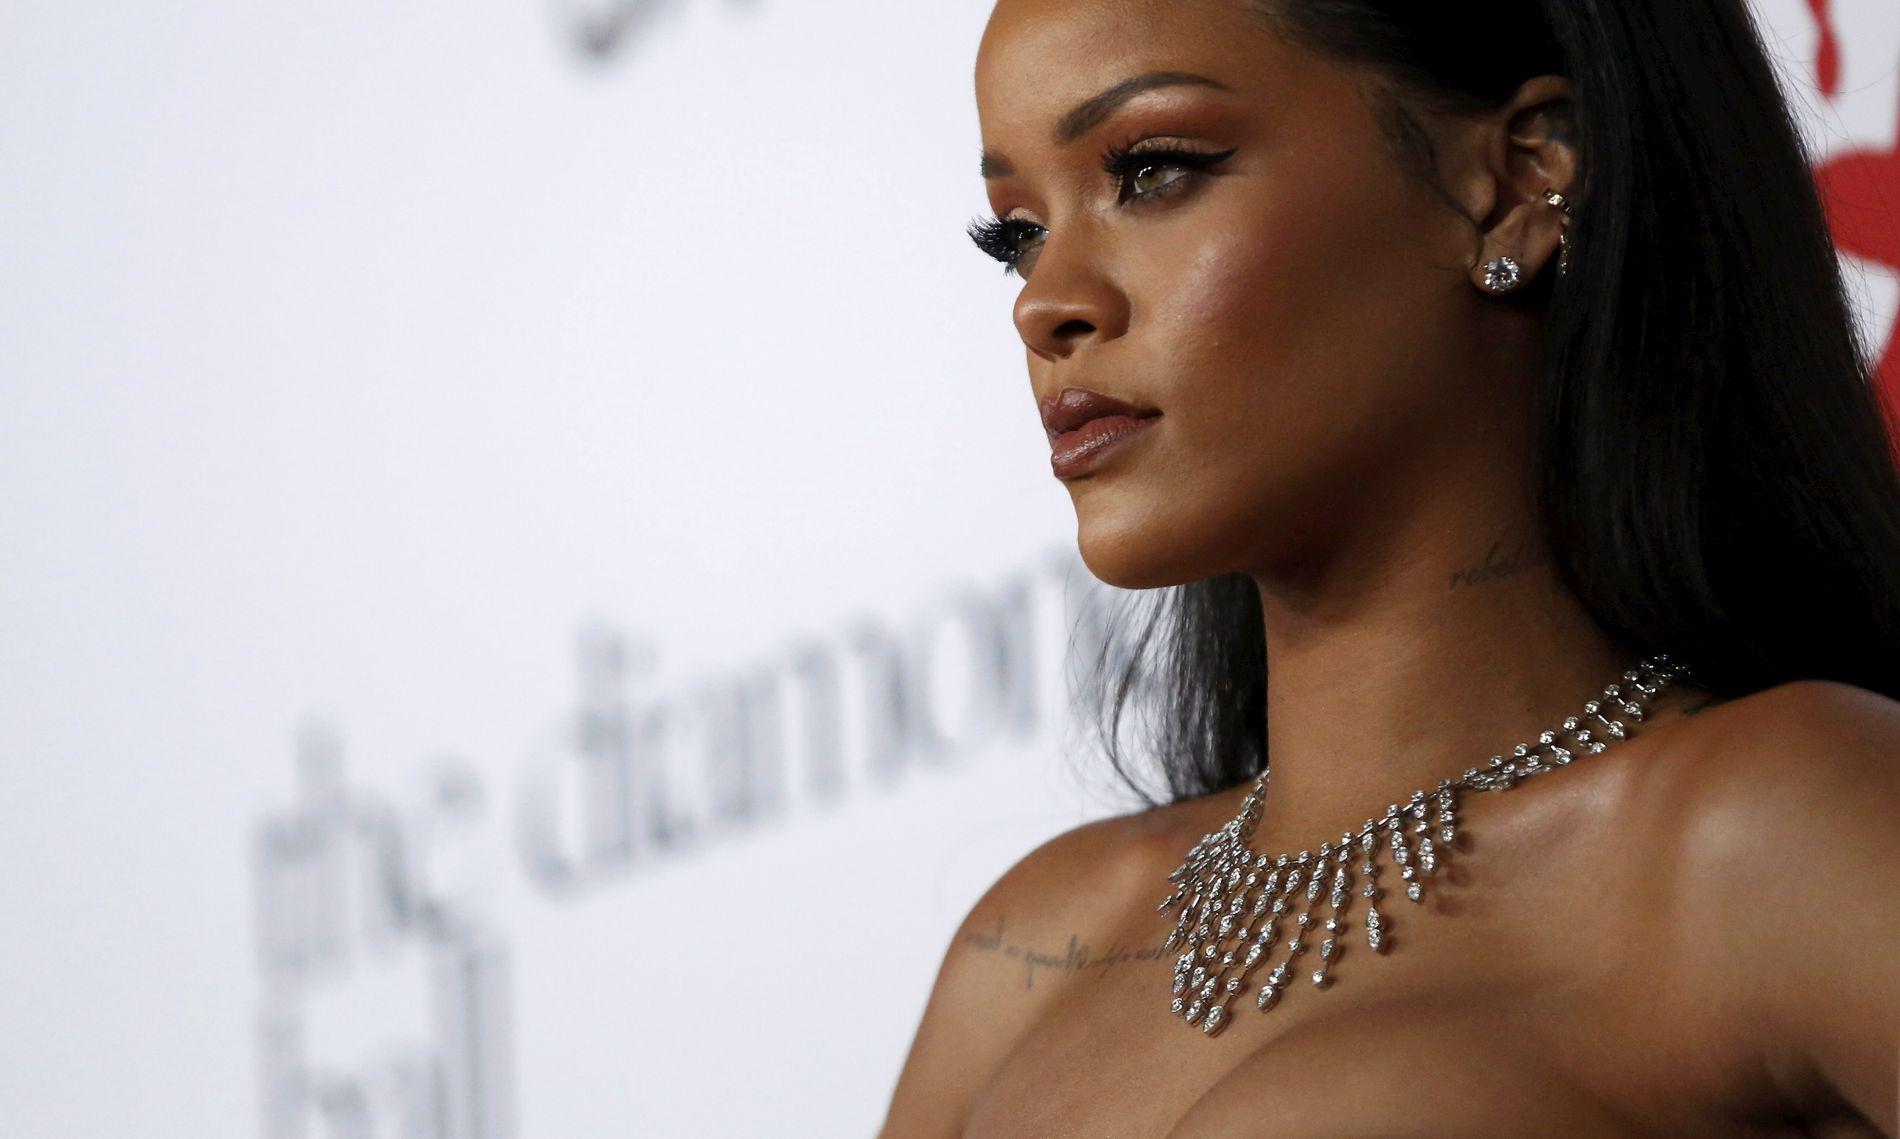 BEKYMRET: Rihanna poserer på Diamond Ball i Santa Monica, California 10. desember, 2015. REUTERS/Mario Anzuoni